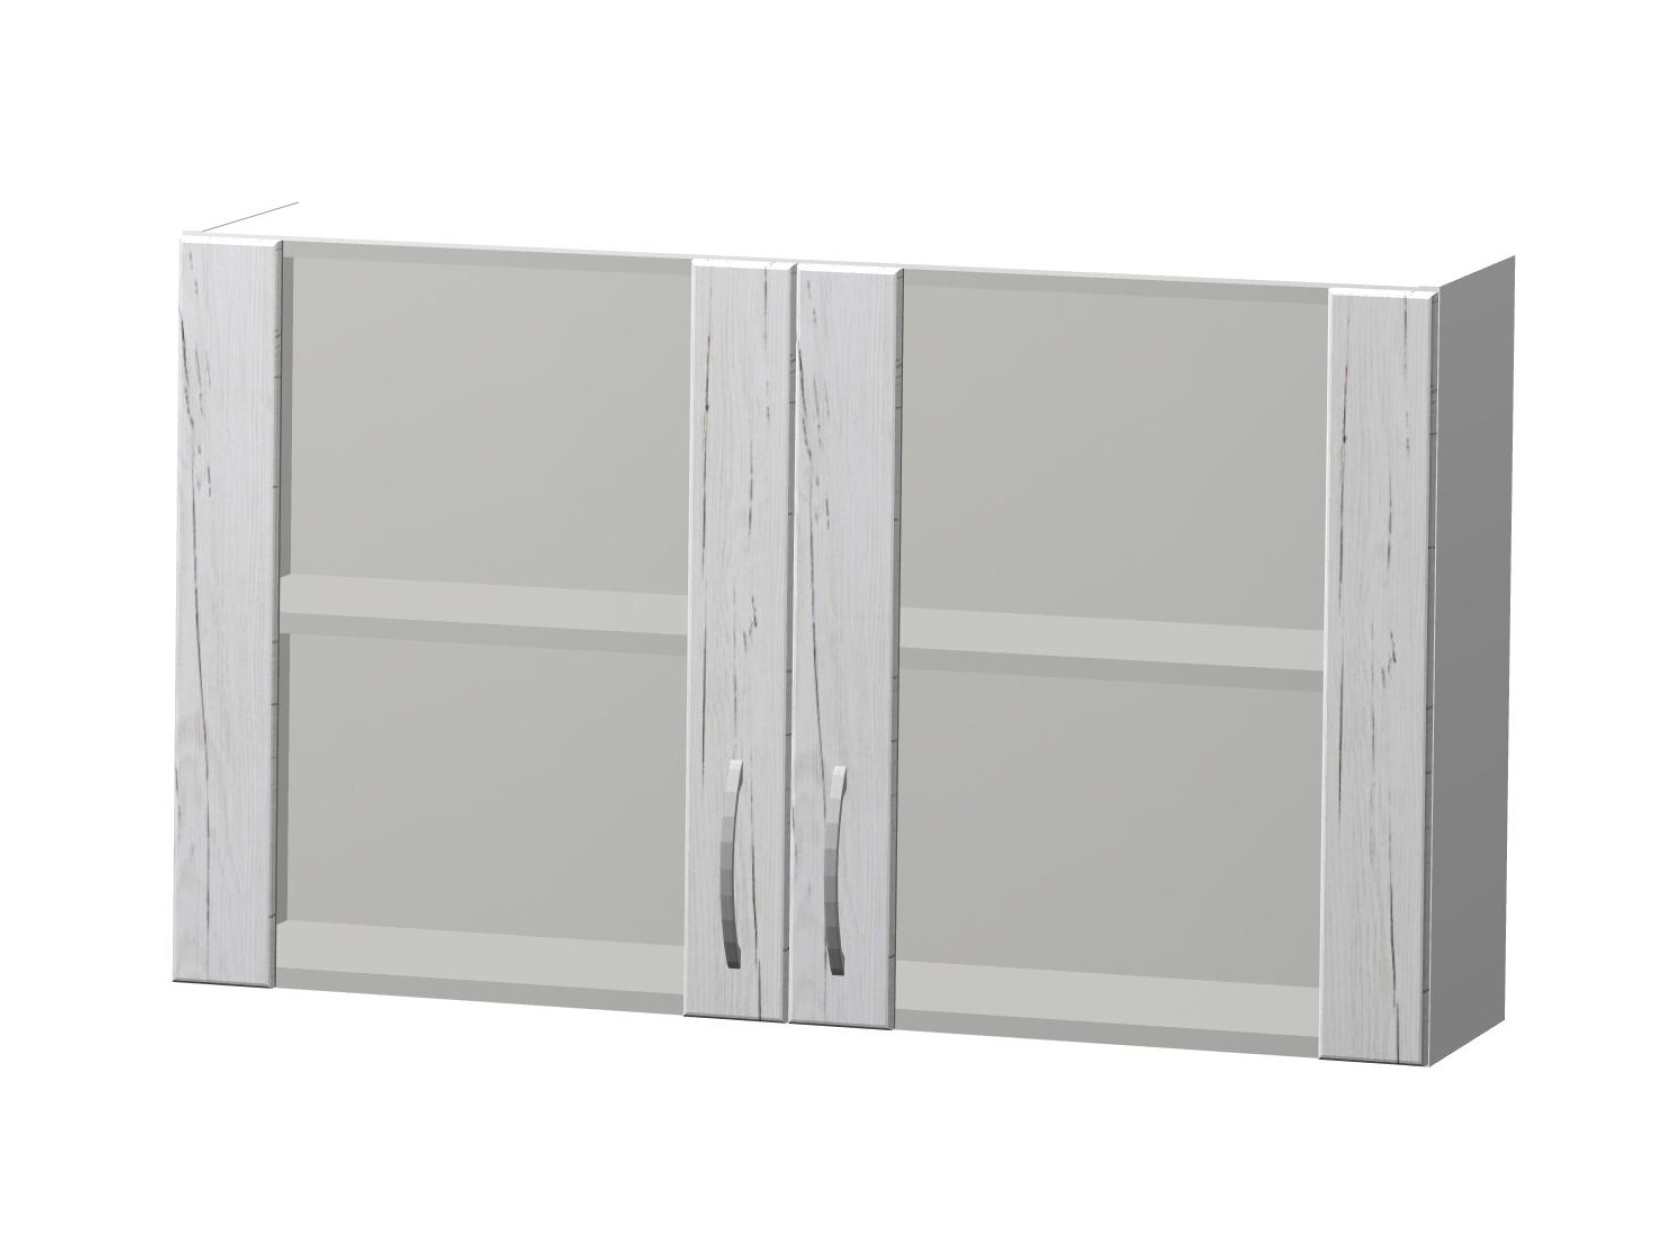 ADELA horní vitrína H 100 Z, korpus bílý/dvířka pino aurelio